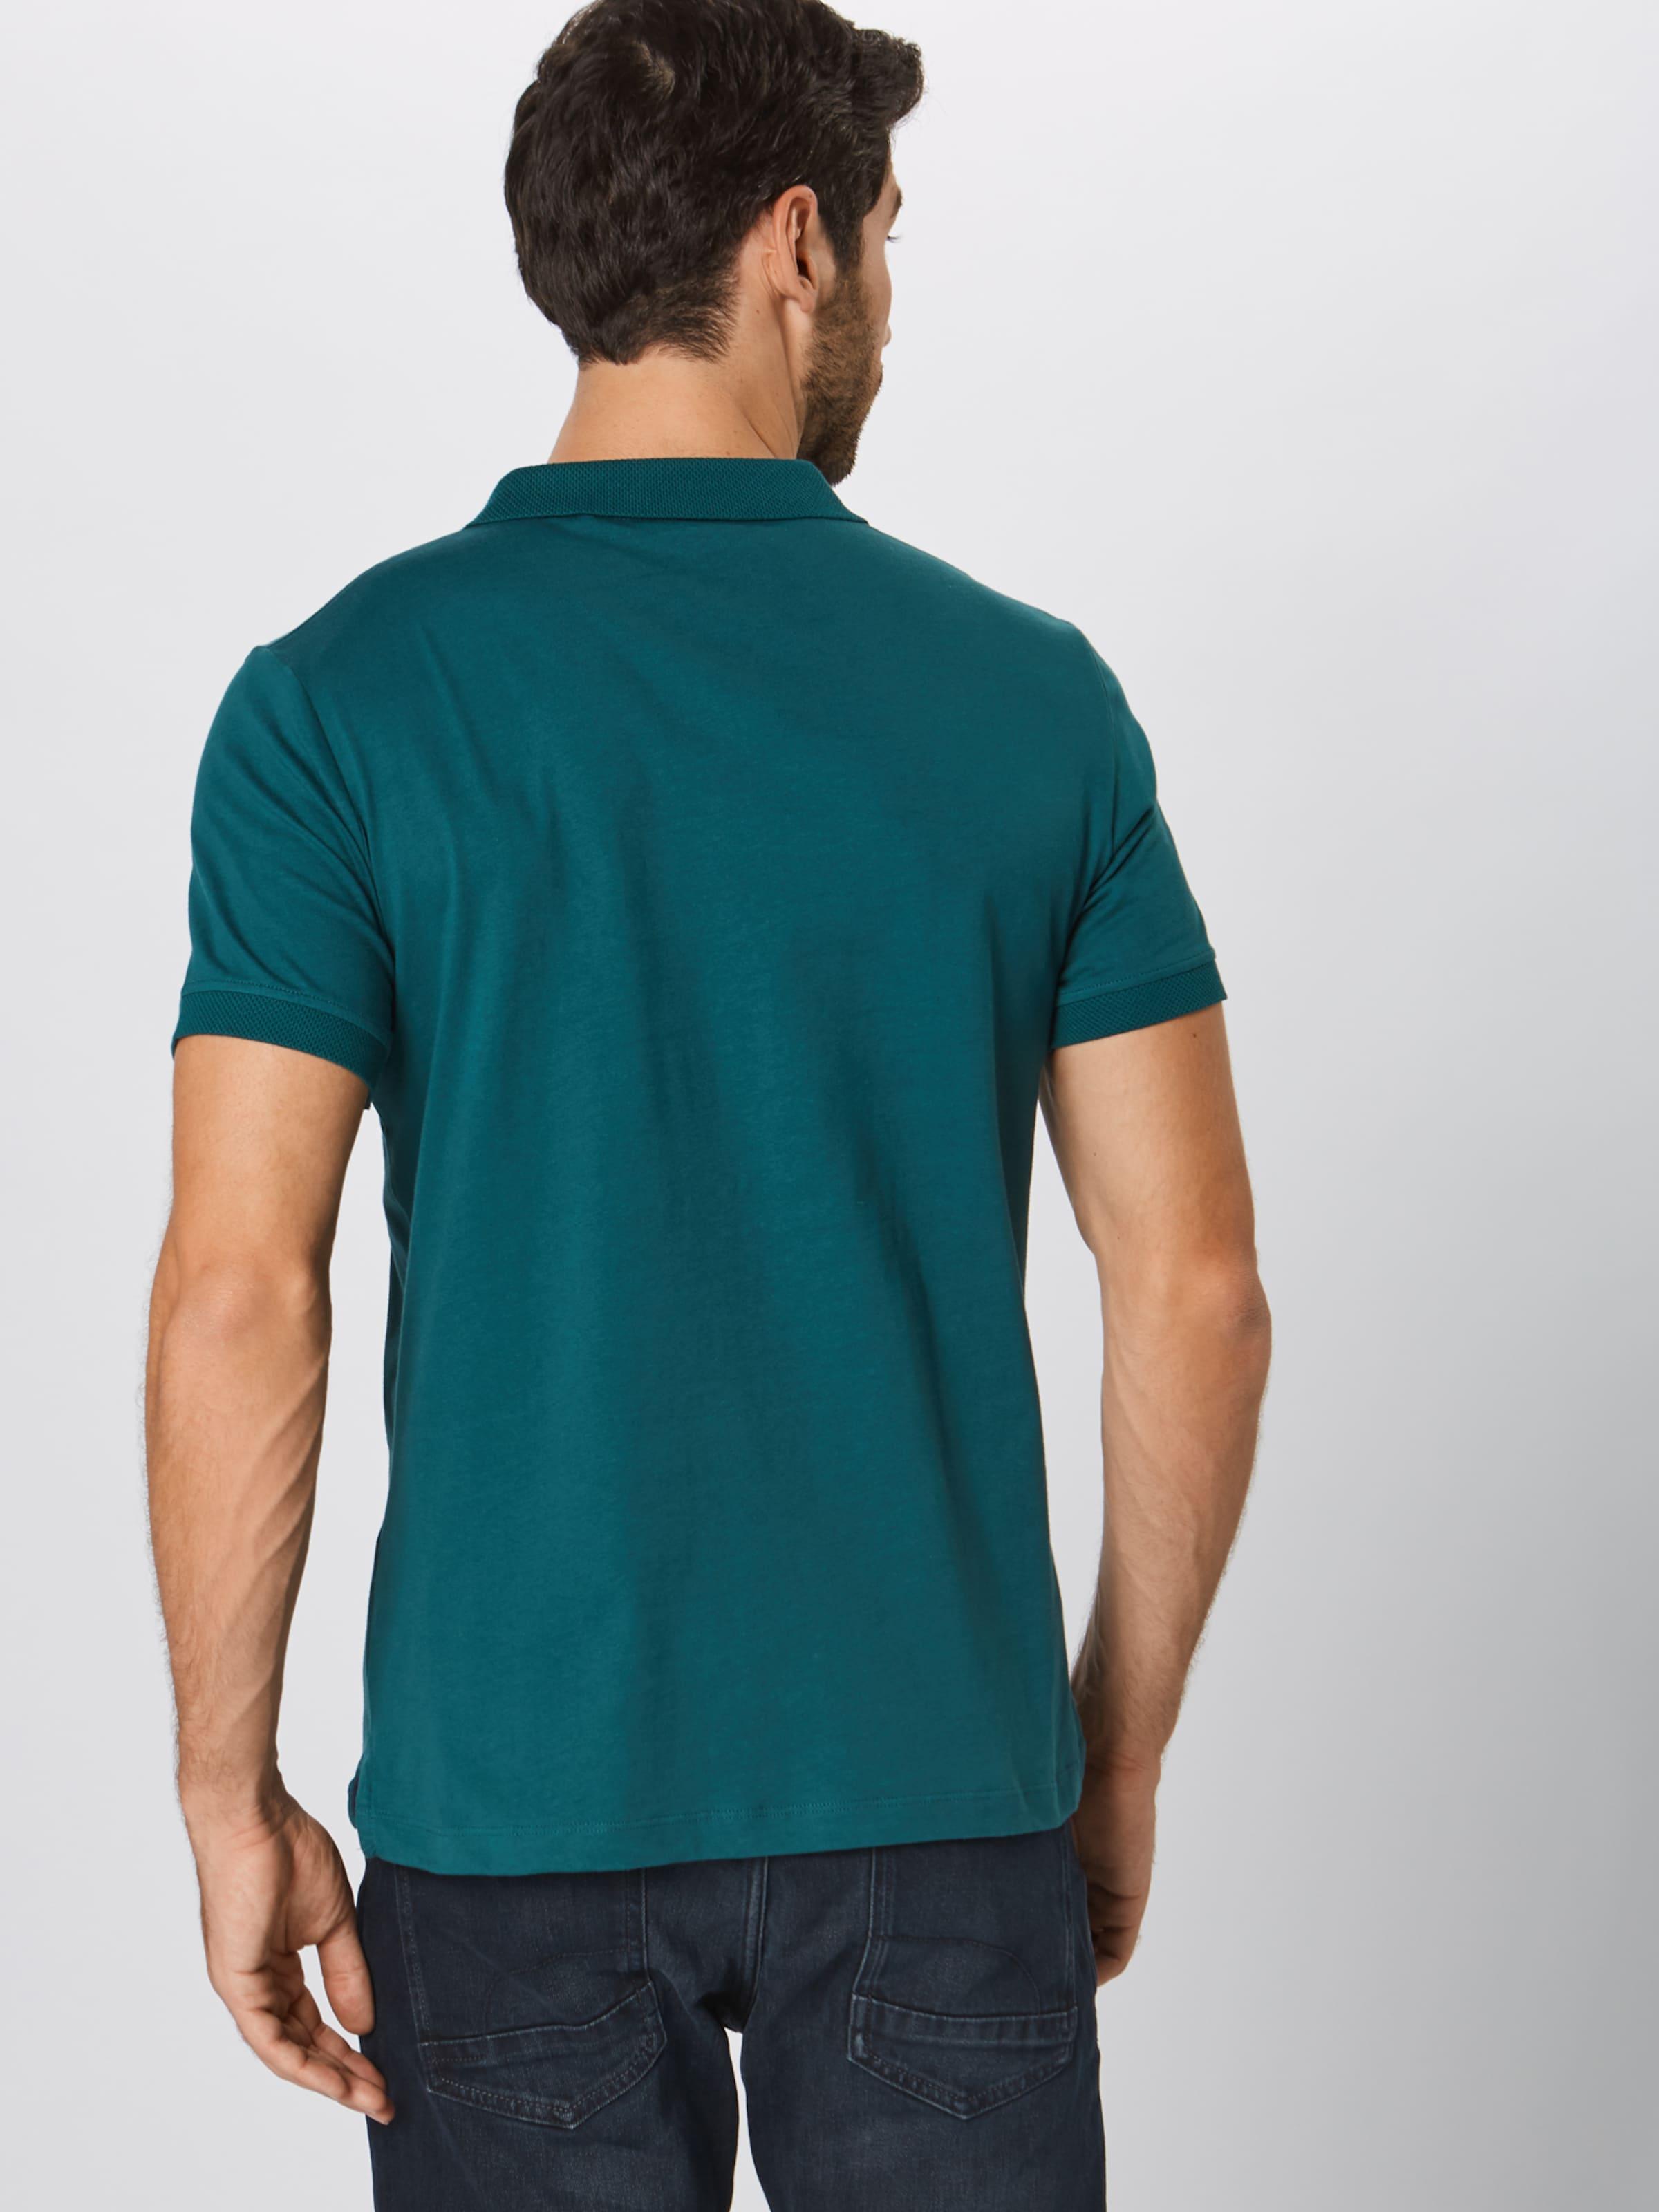 S S Poloshirt BlauPetrol BlauPetrol oliver oliver oliver S Poloshirt In In Py0vNw8mnO